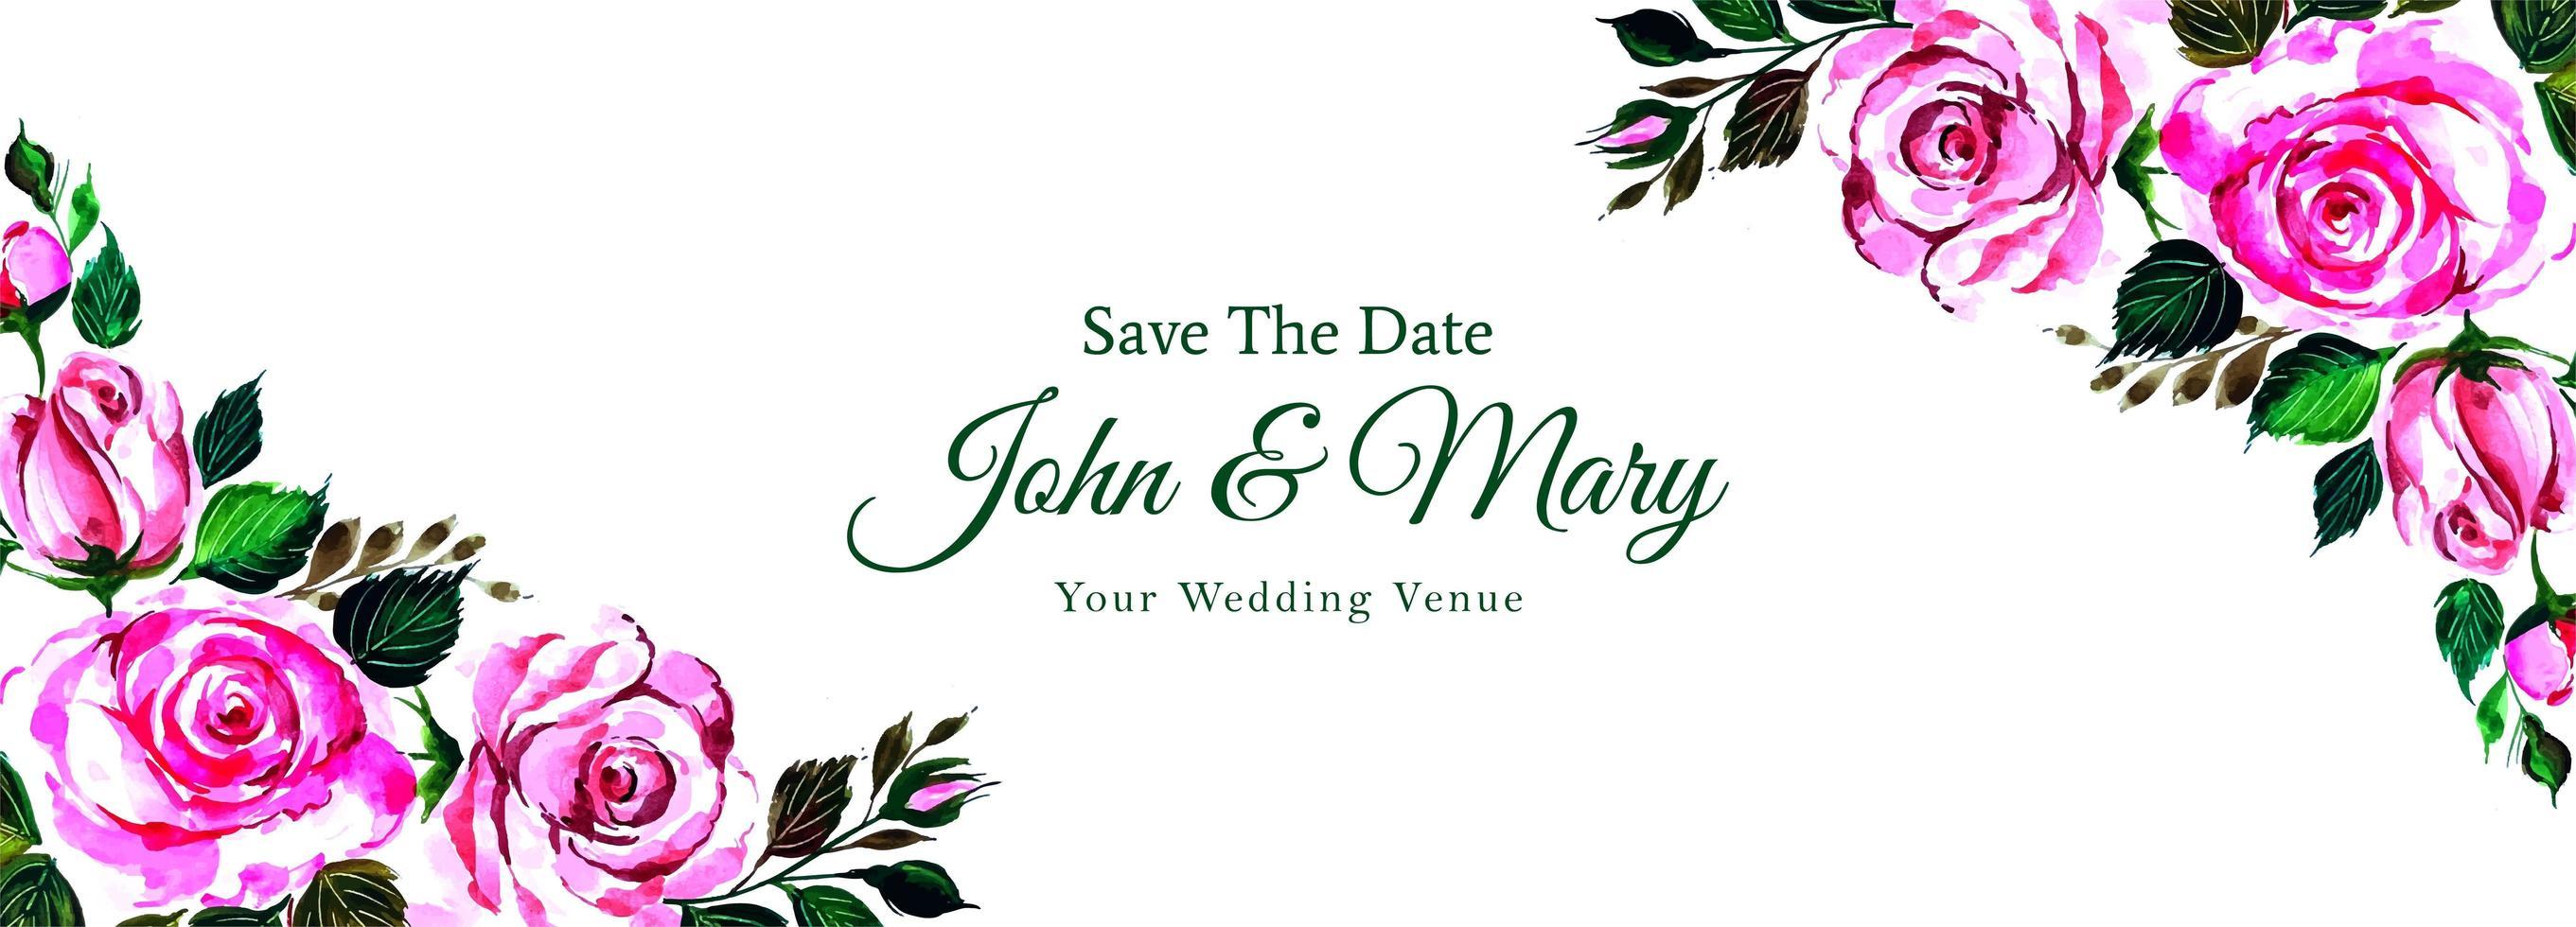 Beautiful Decorative Corners Floral Wedding Banner Download Free Vectors Clipart Graphics Vector Art